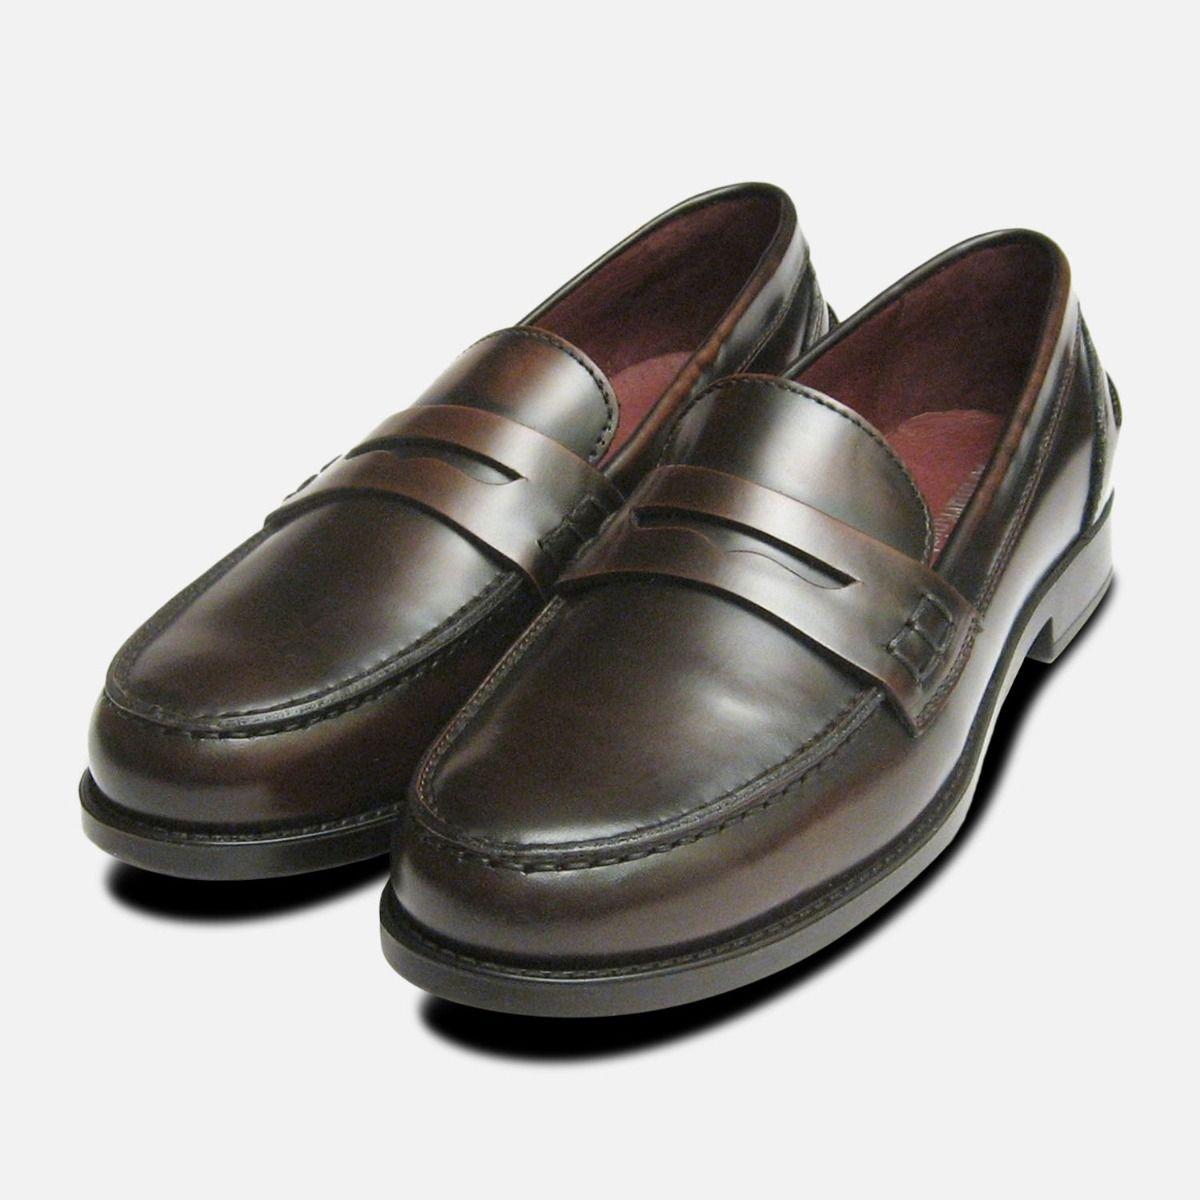 7bd51c6373c15 Dark Brown Polished Designer Ladies Italian College Shoes